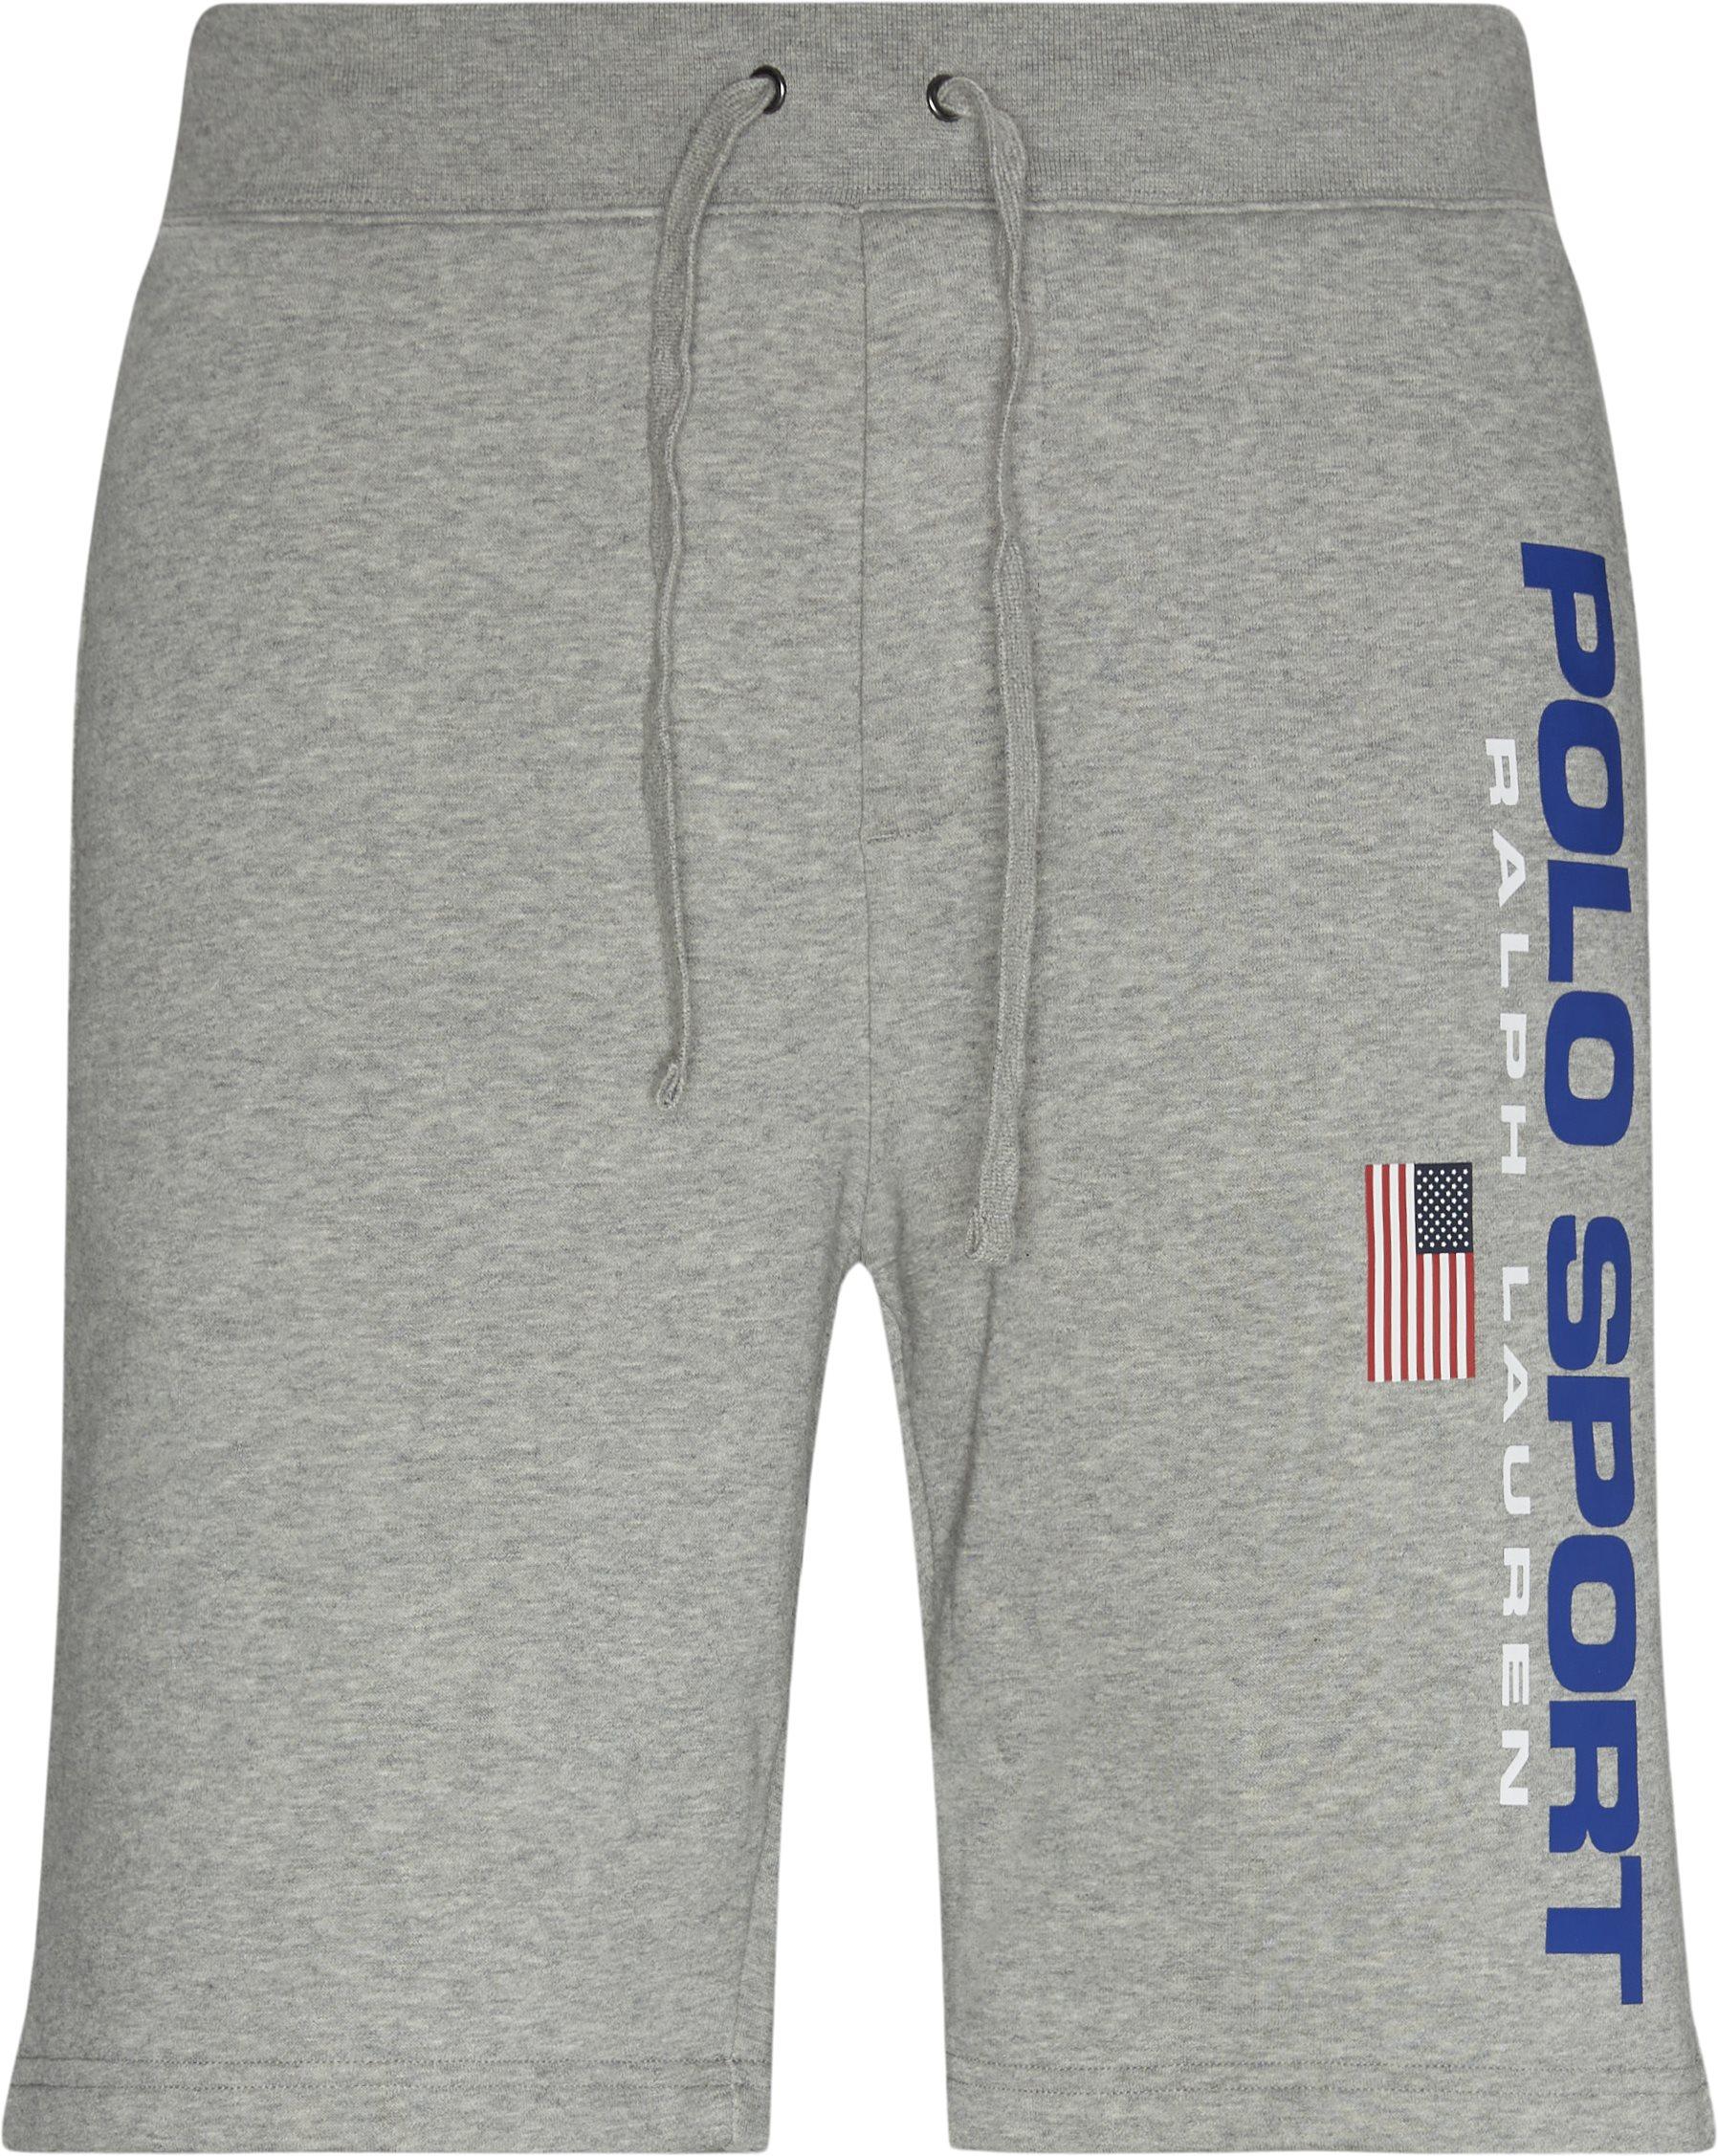 Shorts - Regular fit - Grey